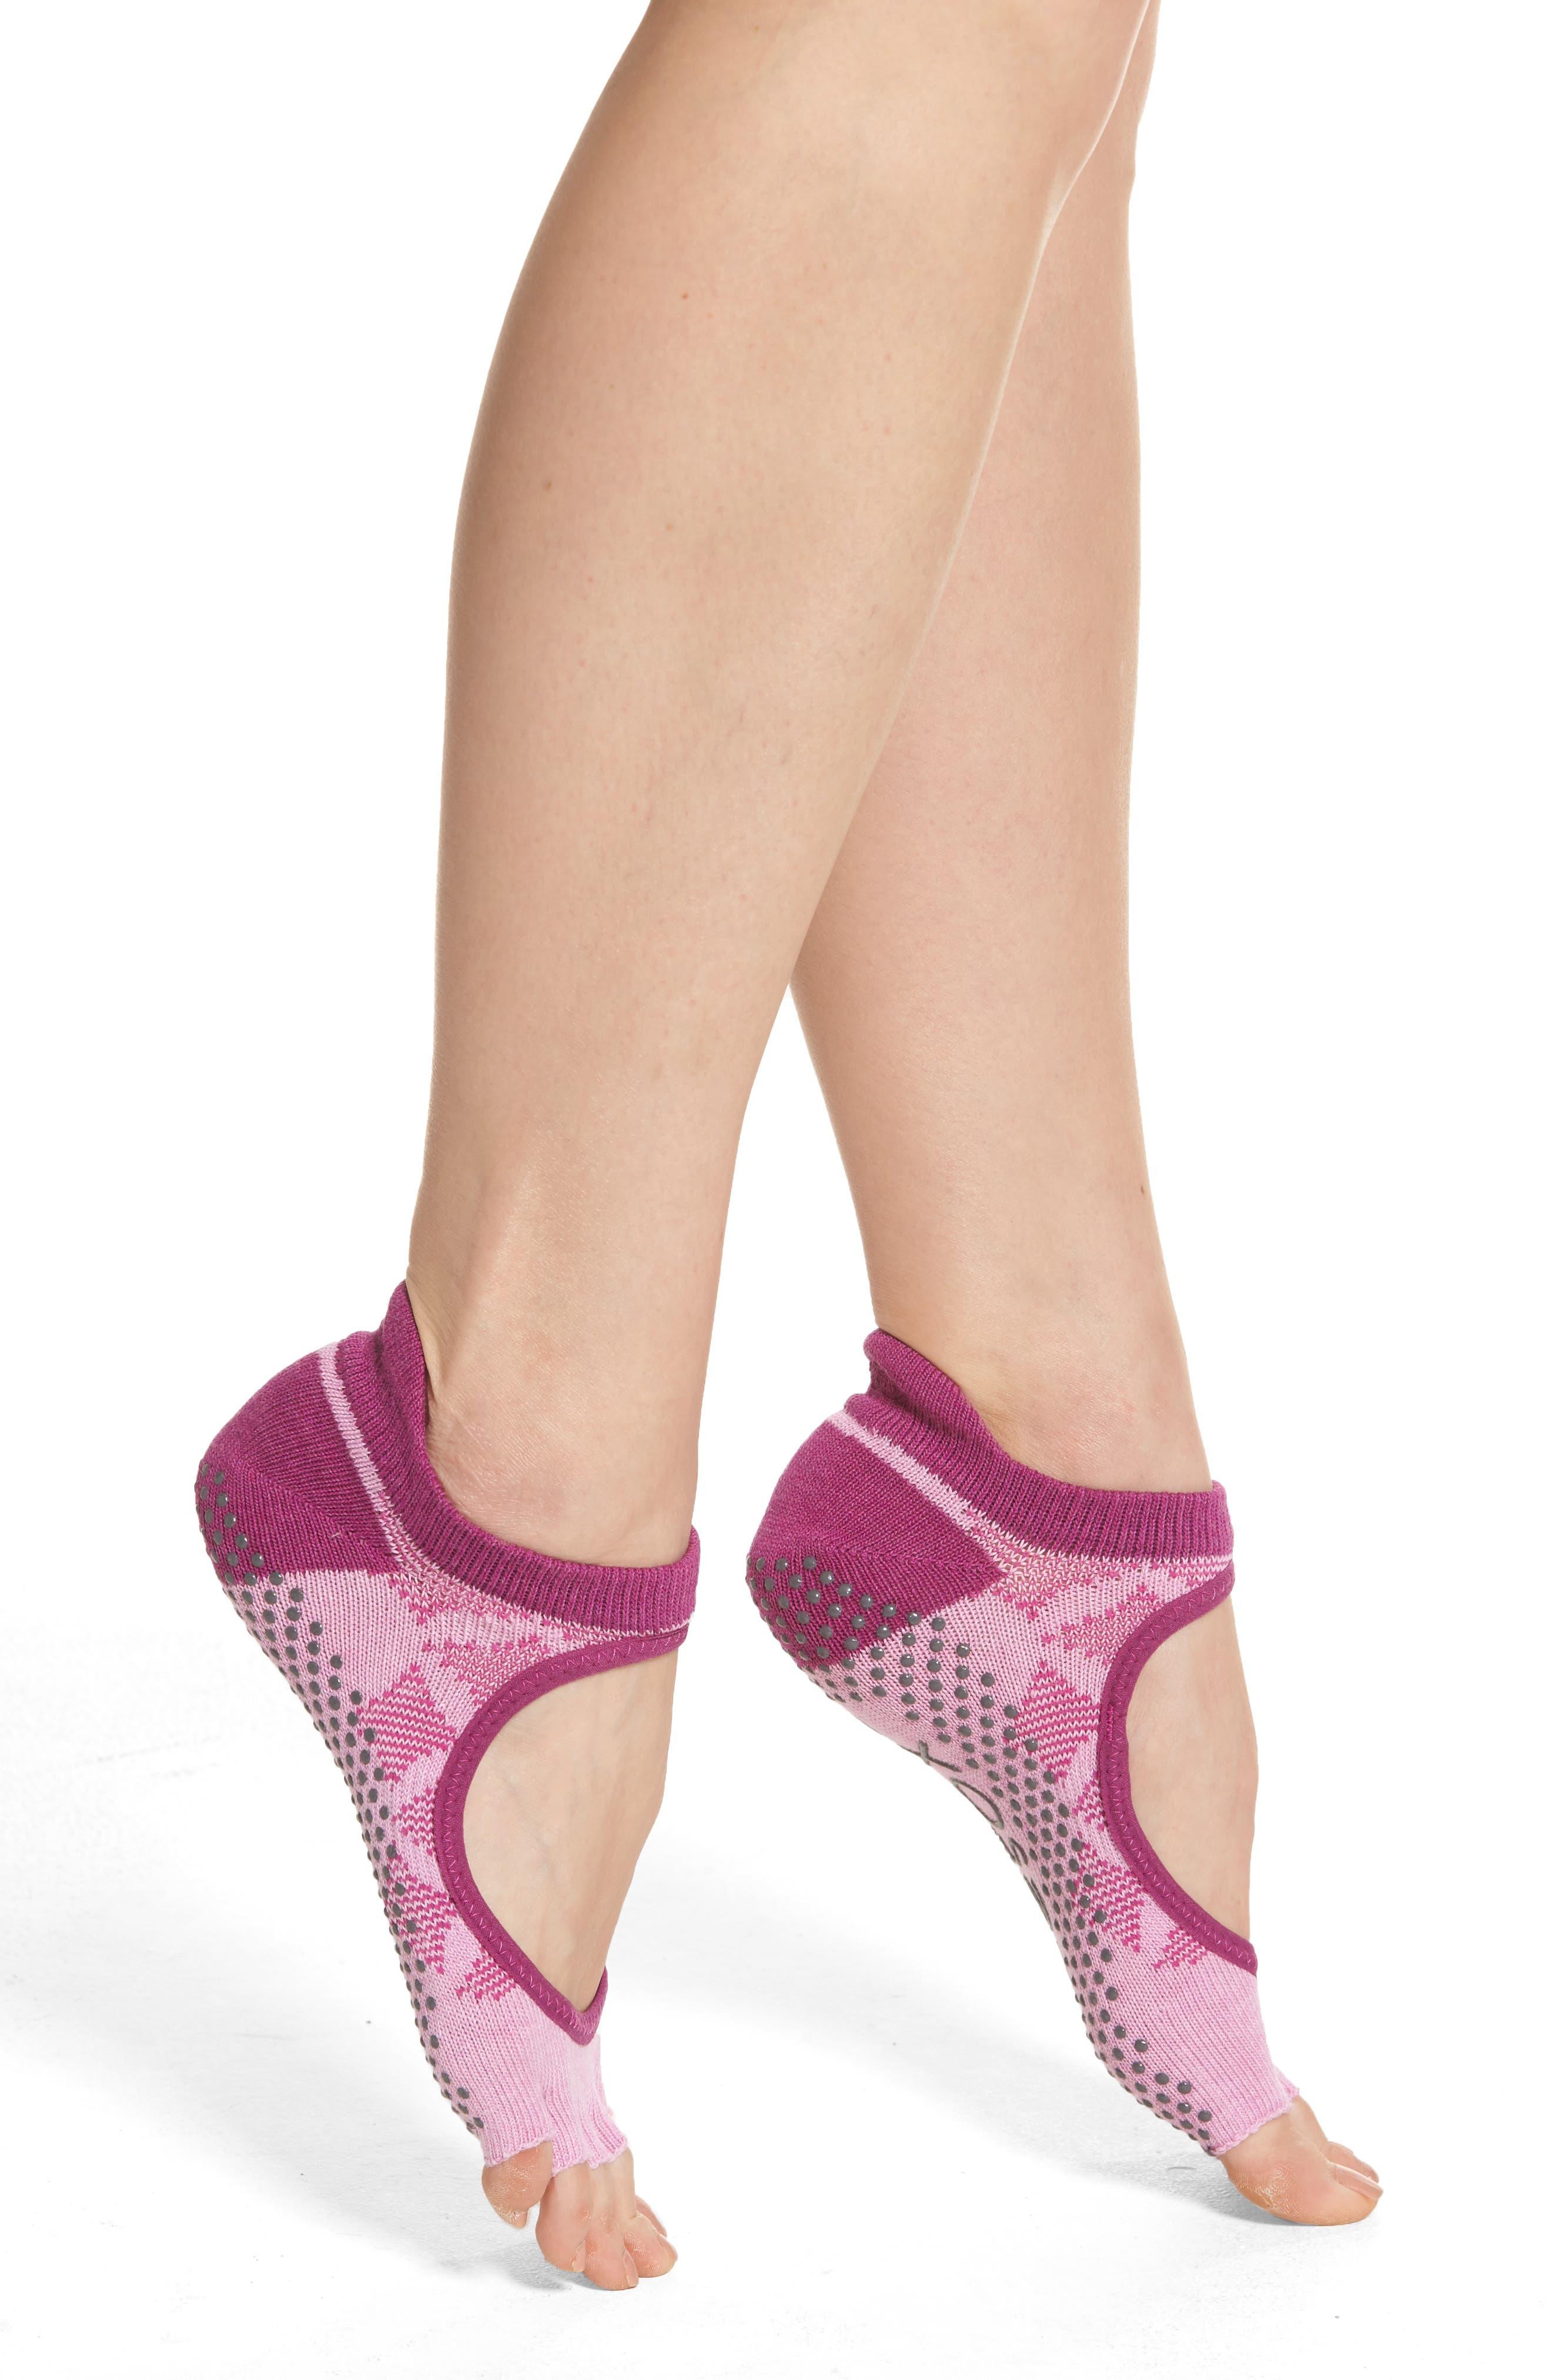 ToeSox Bellarina Half Toe Gripper Socks